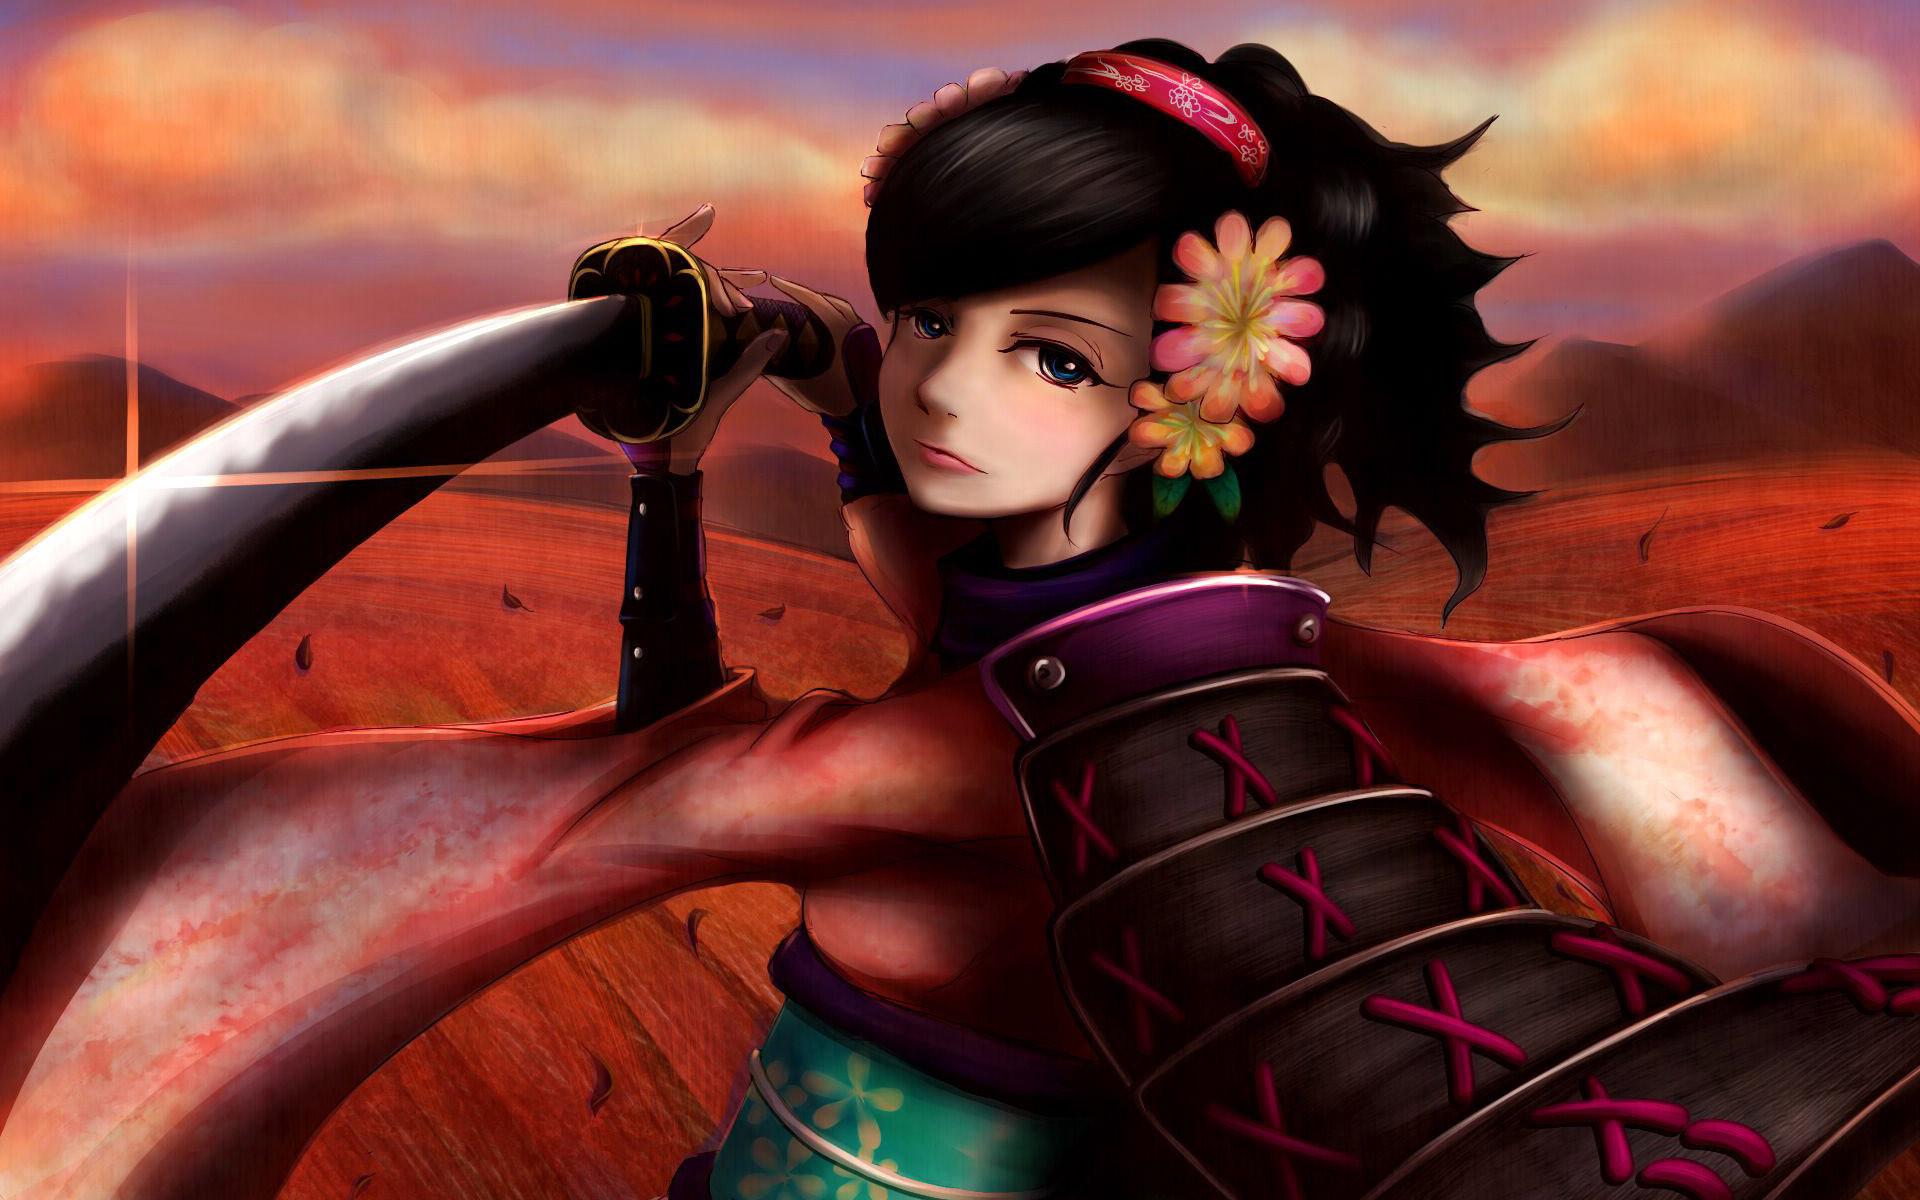 Res: 1920x1200, Muramasa: The Demon Blade HD Wallpapers